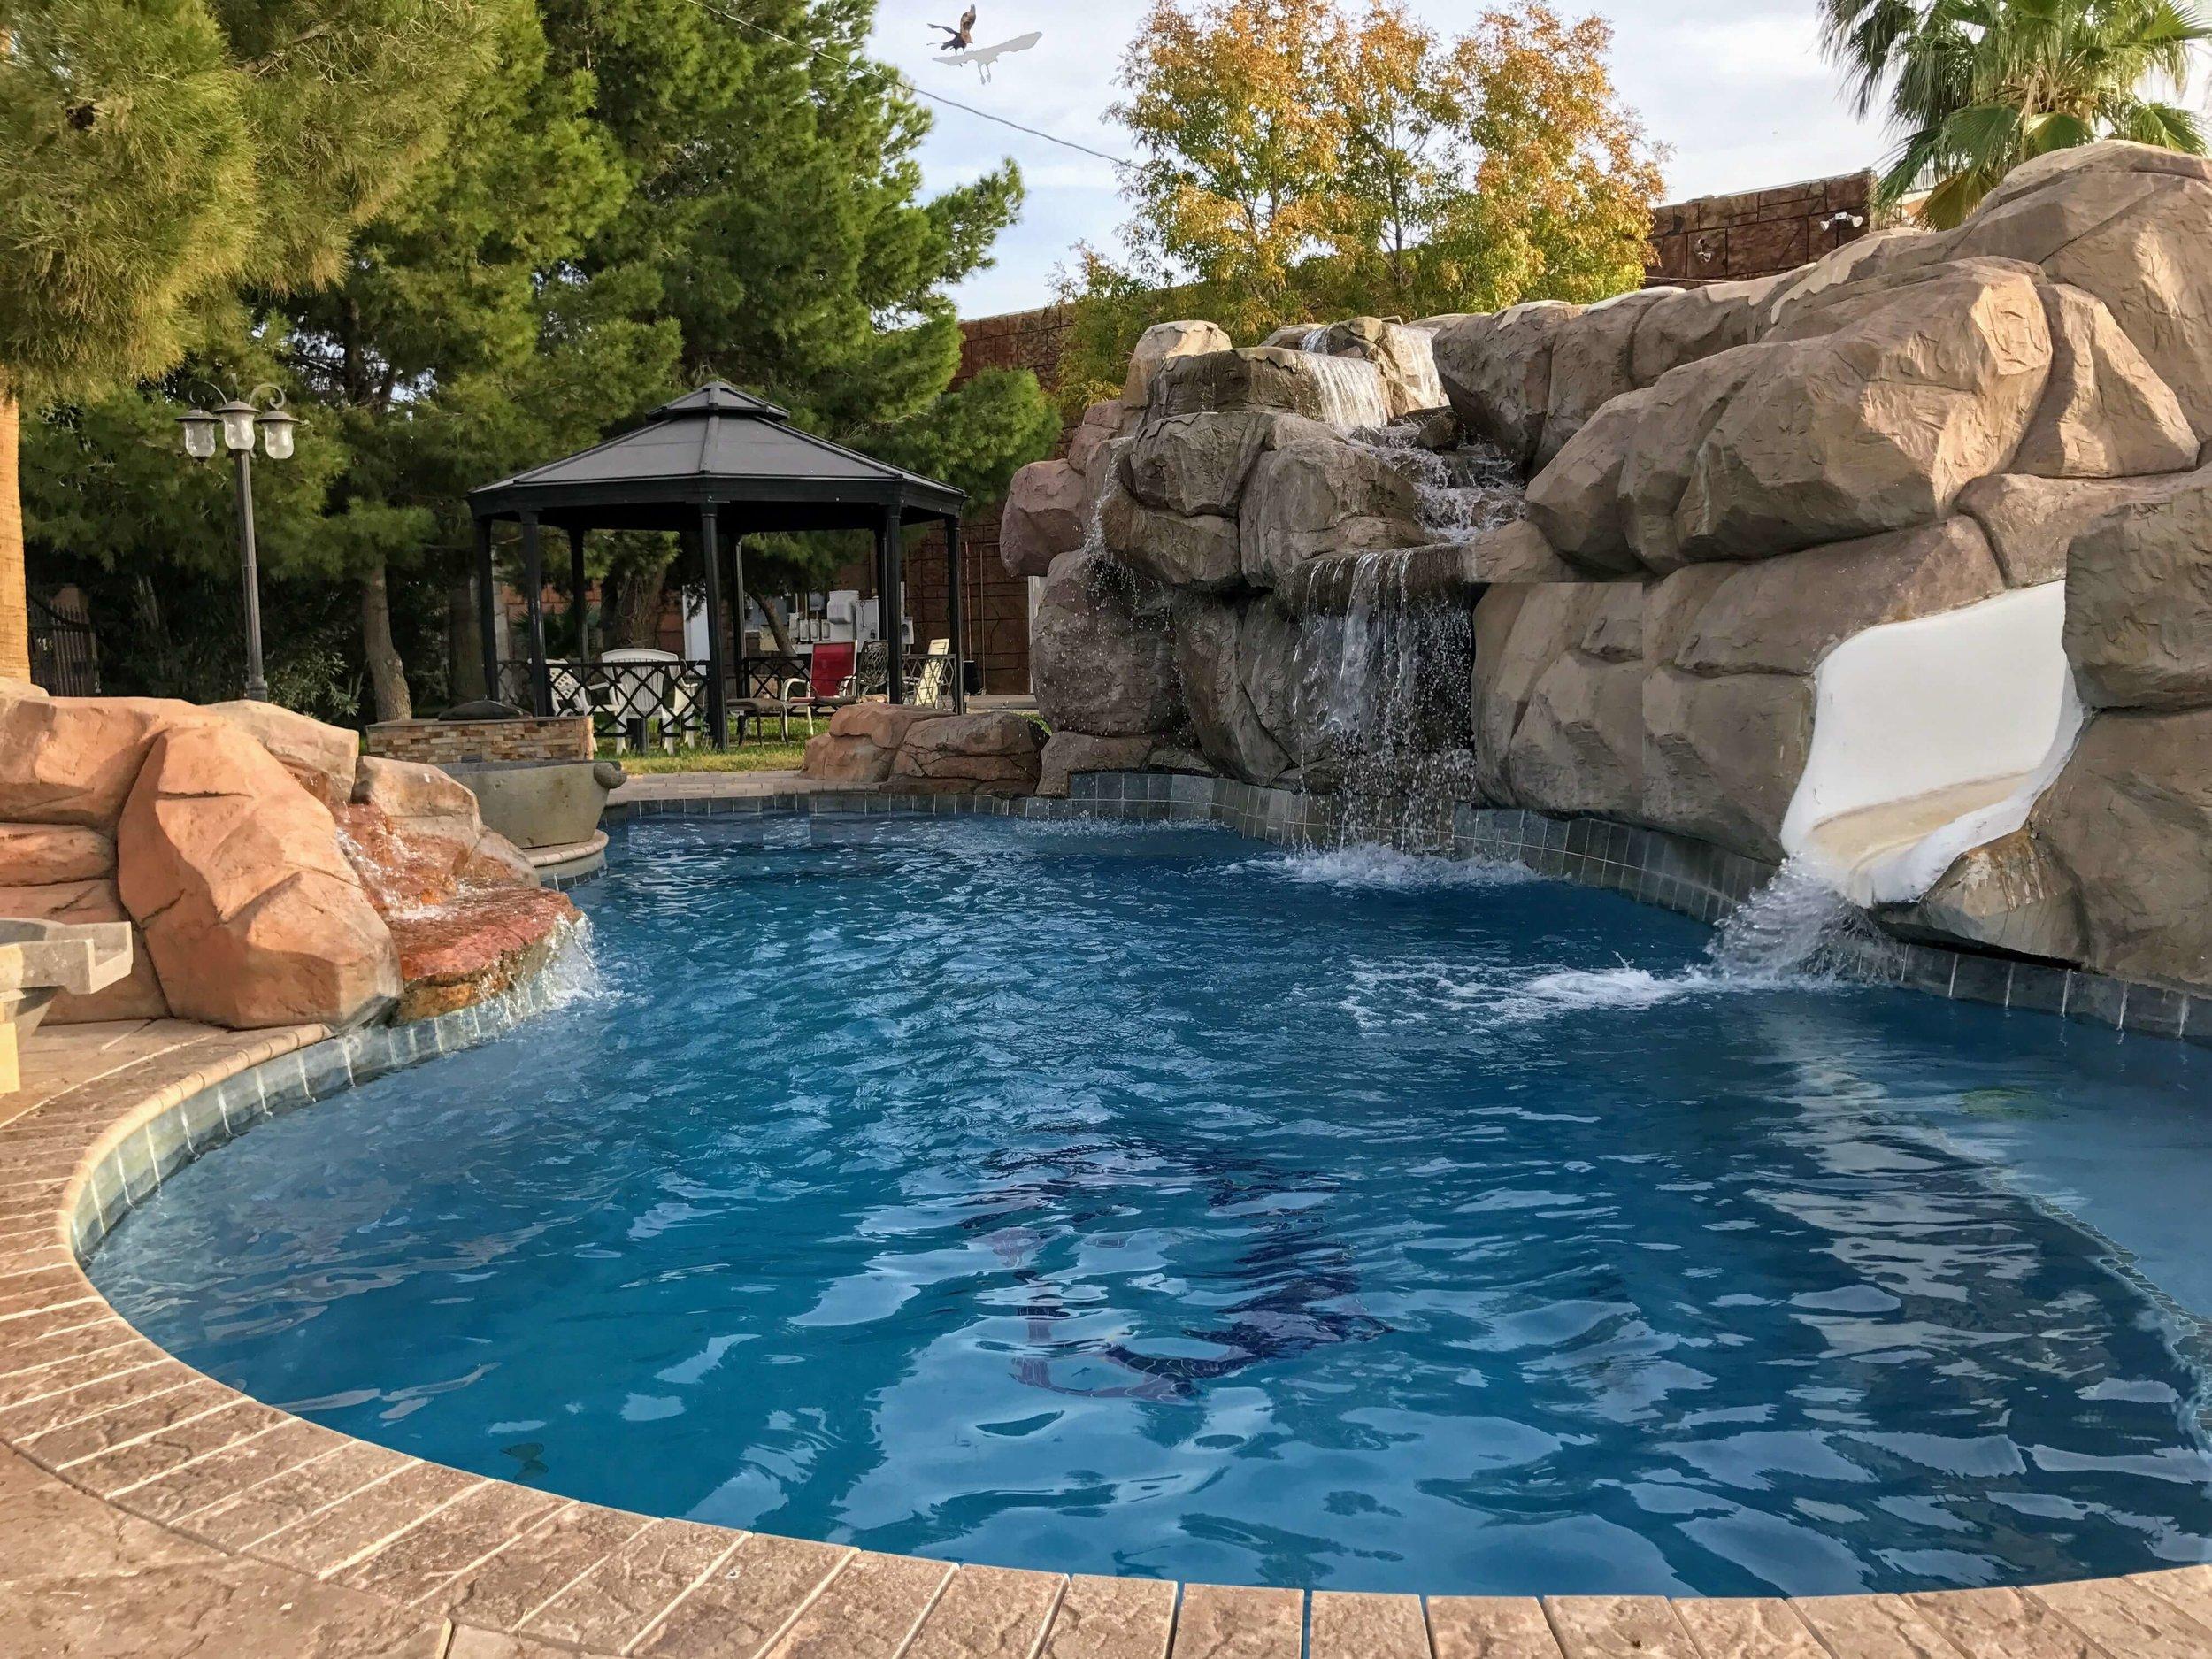 Renaissance Pools Las Vegas Pool Installation Company